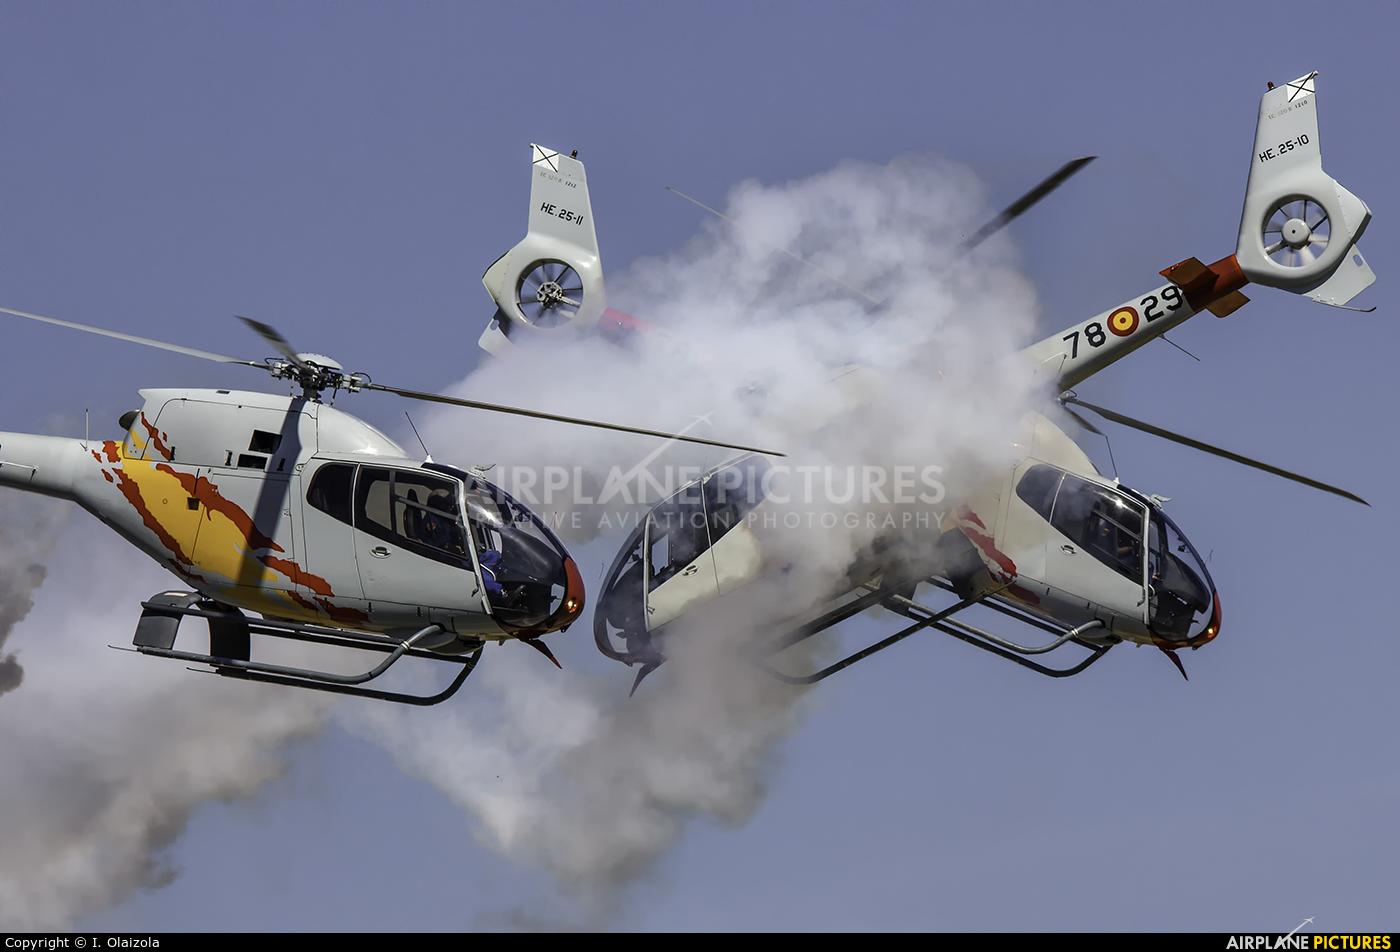 Spain - Air Force: Patrulla ASPA HE.25-1 aircraft at León